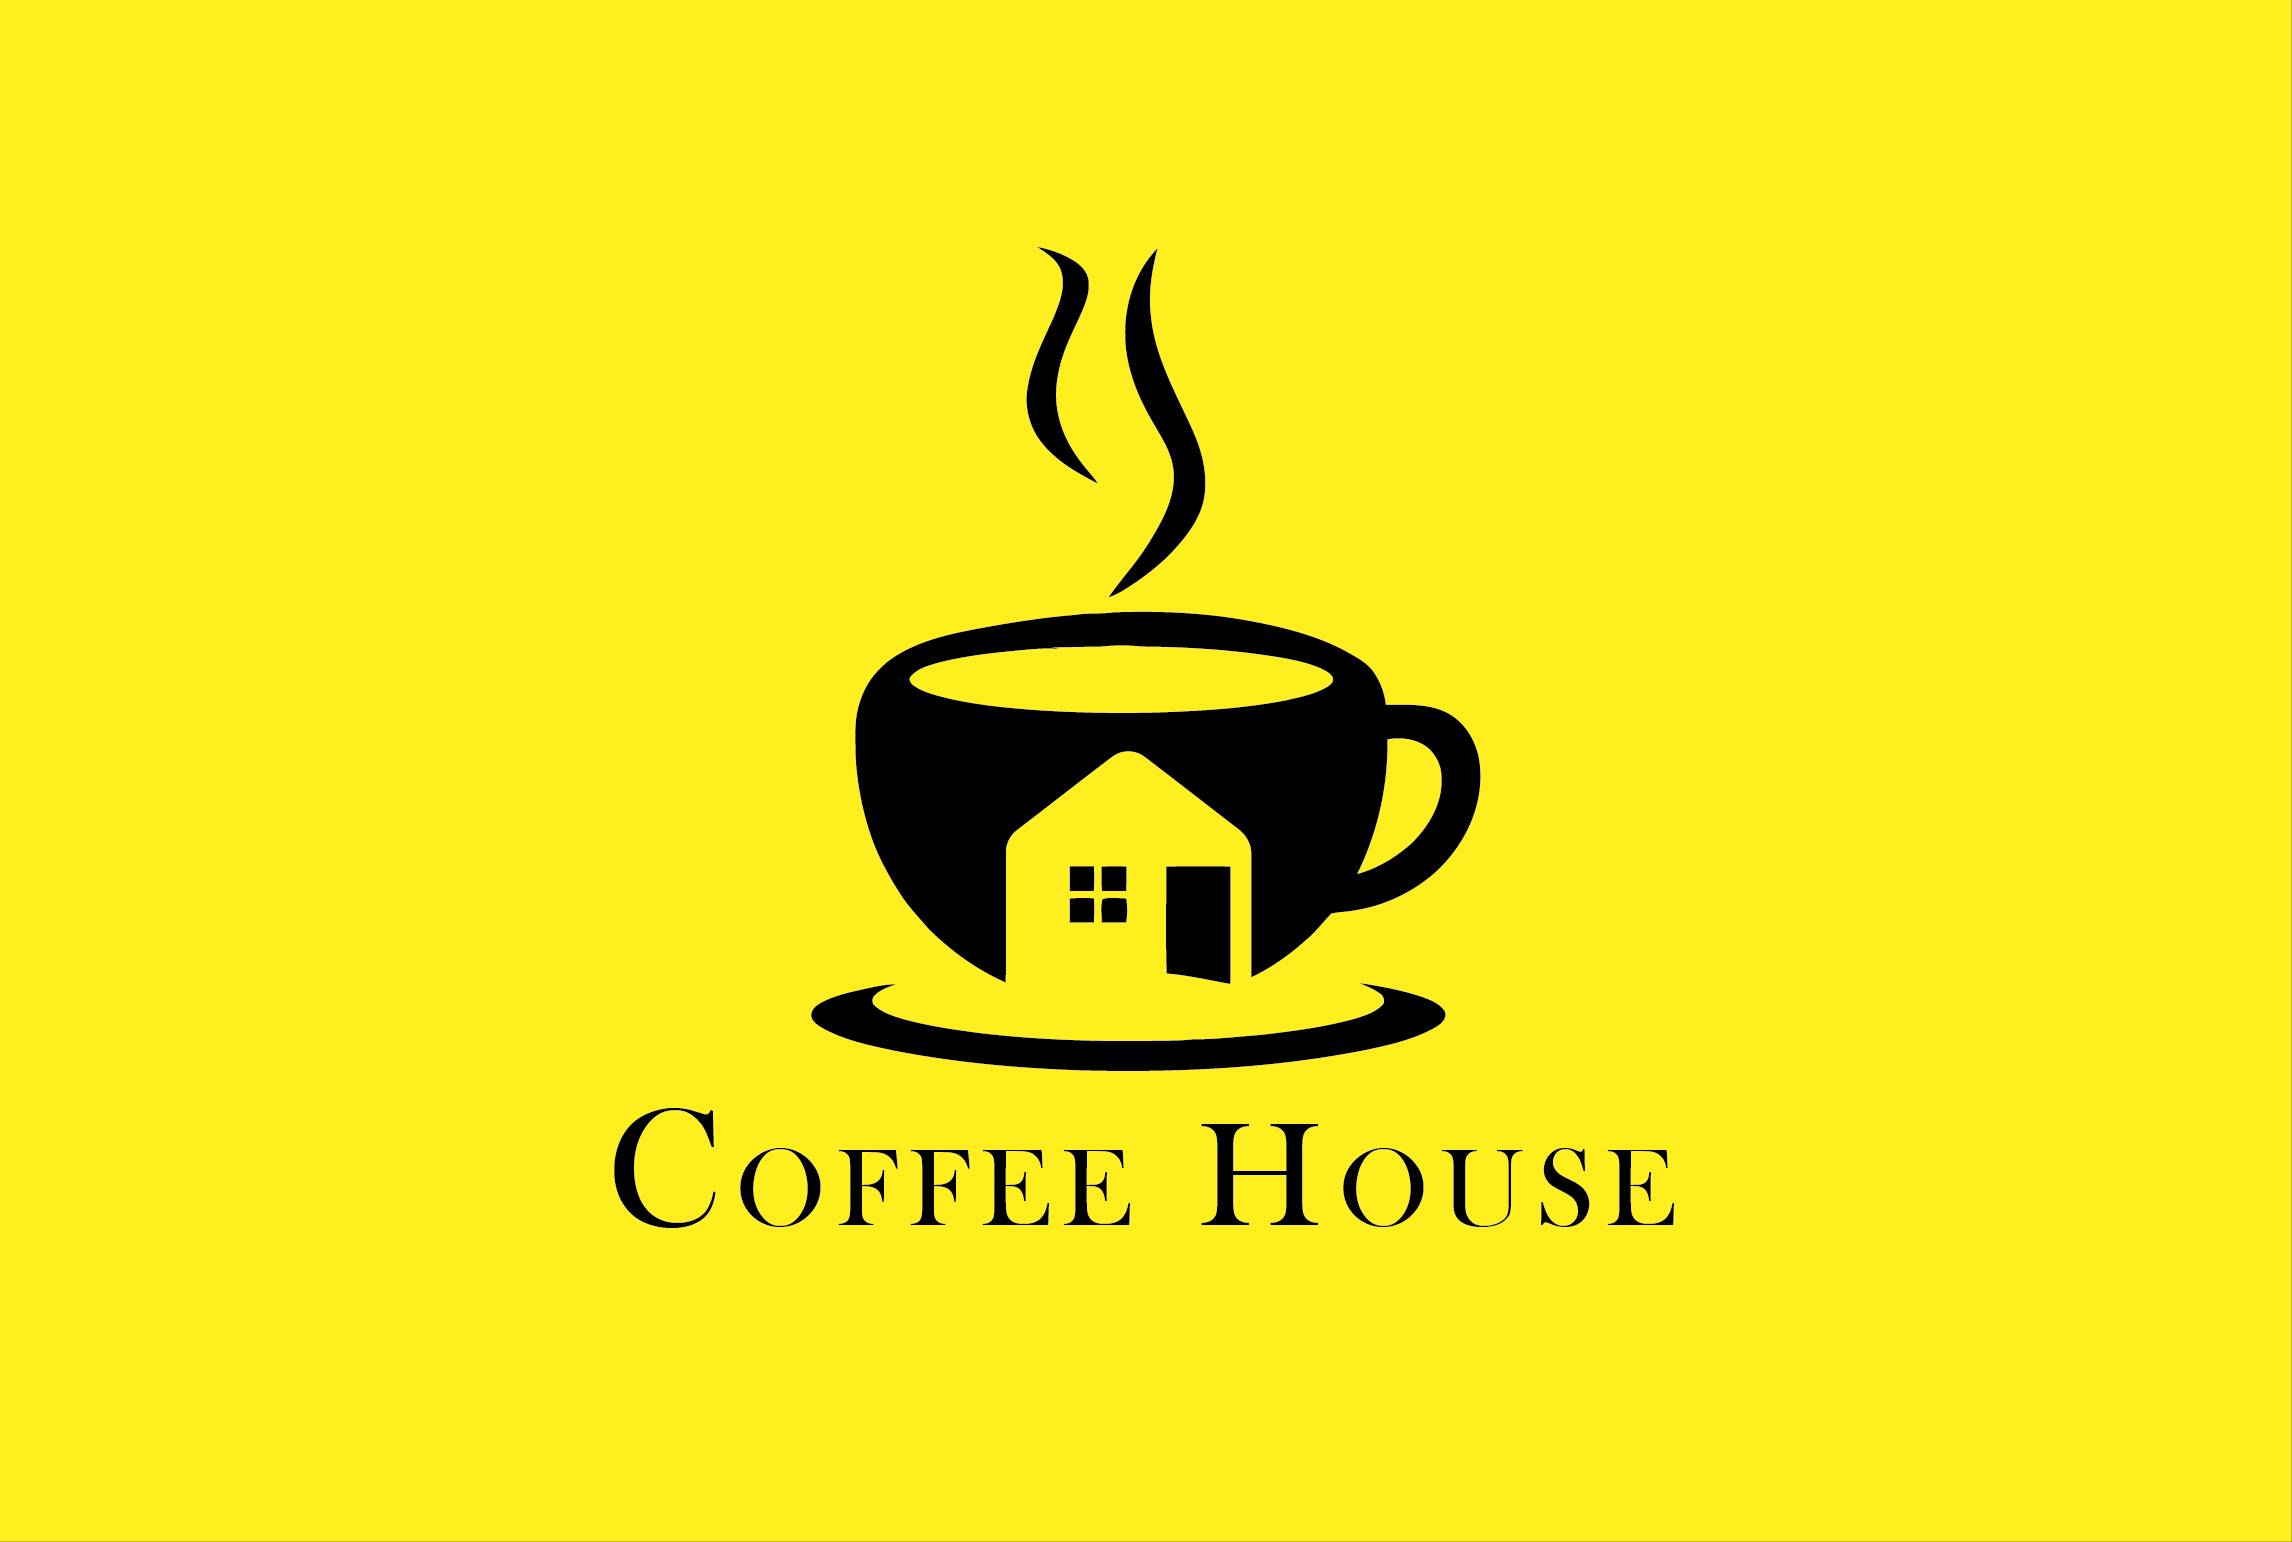 I will do food and restaurant logo design